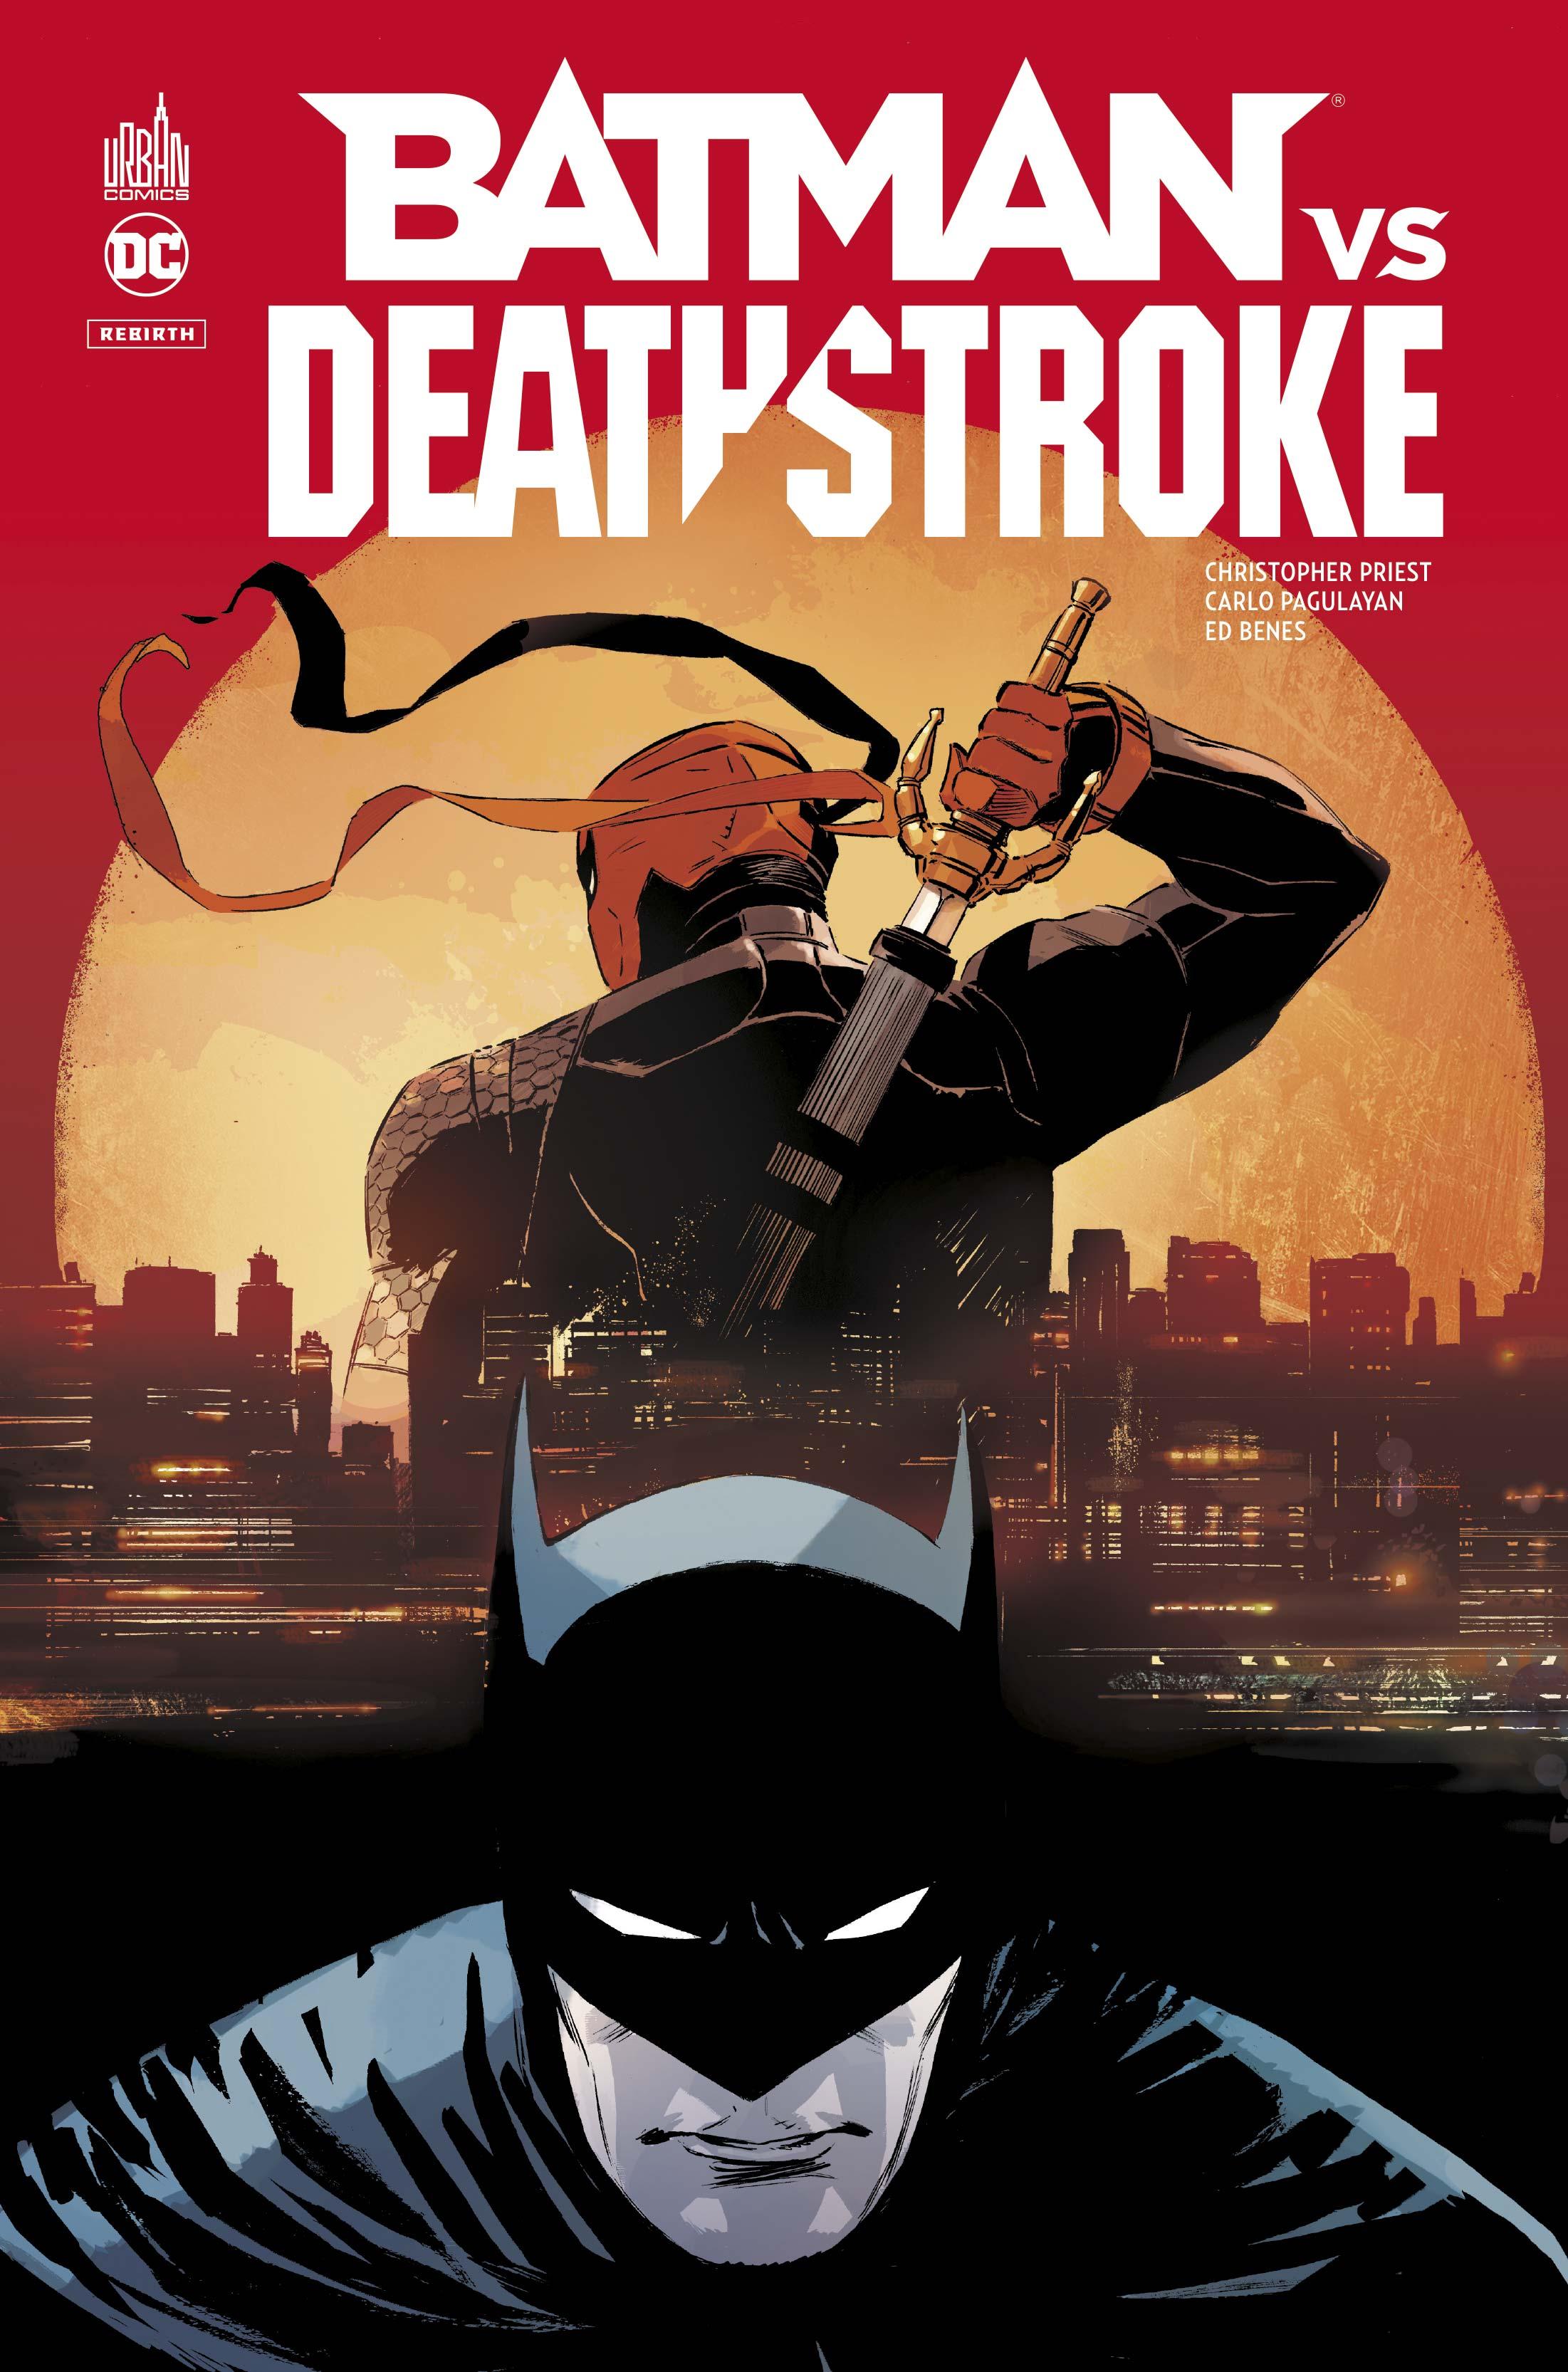 Batman vs Deathstroke 1 - Batman vs deathstroke